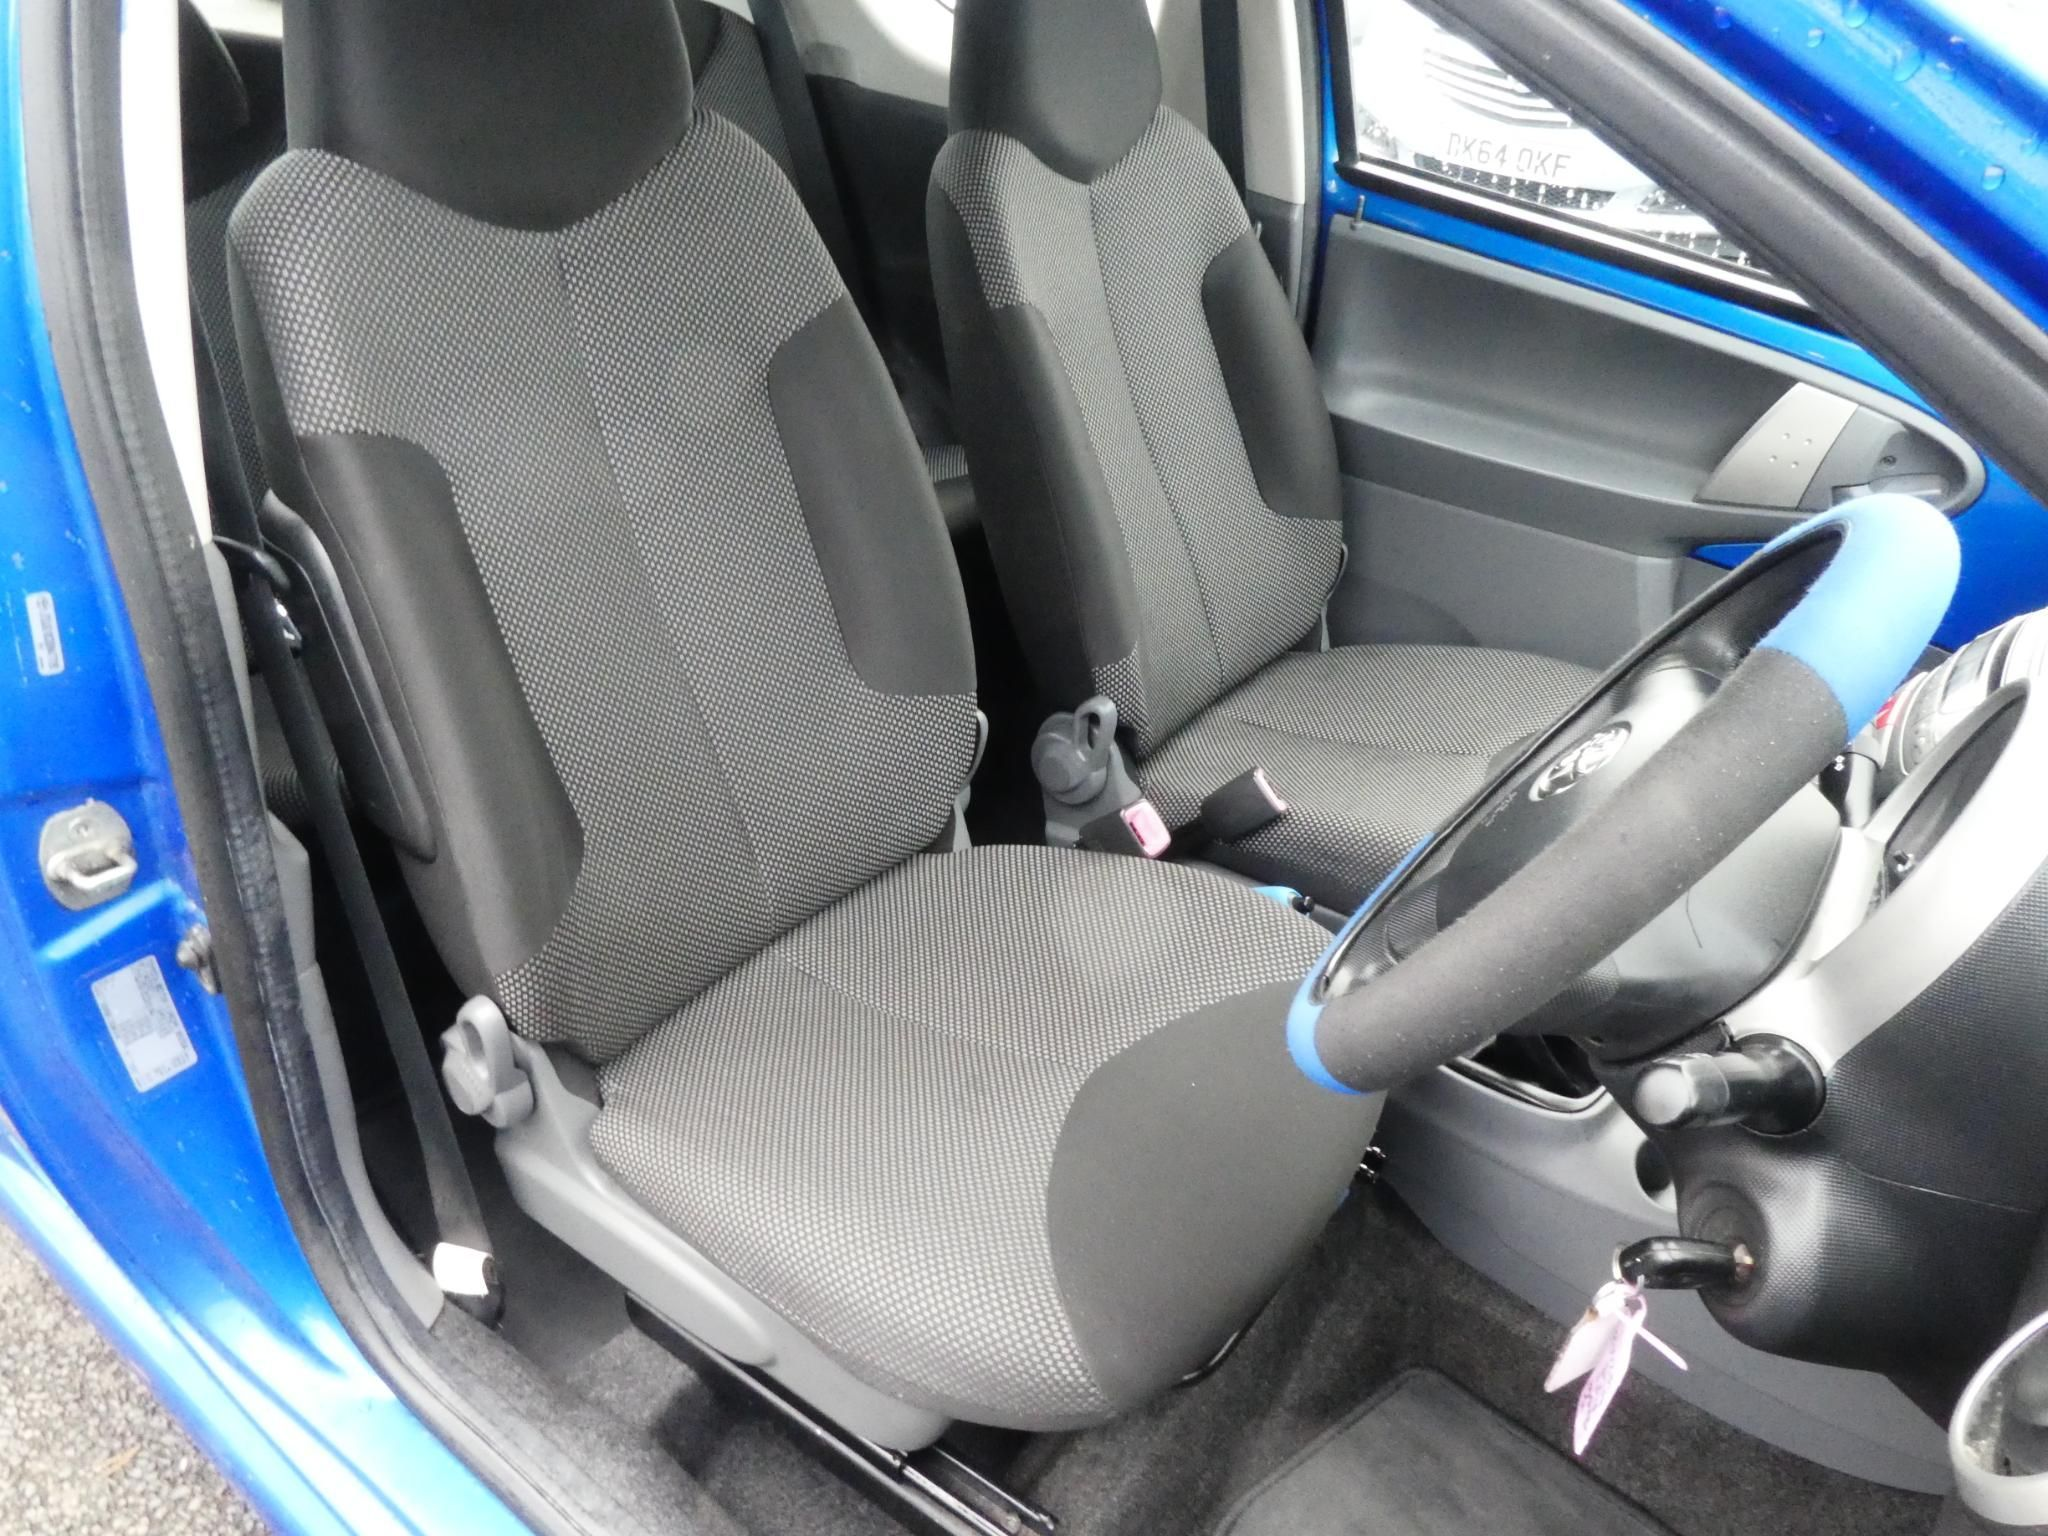 2010 TOYOTA AYGO 1.0 VVT-i Blue Blue Petrol Manual ONLY 31000 MILES – FC Motors 52 Carntall Rd, Newtownabbey BT36 5SD full